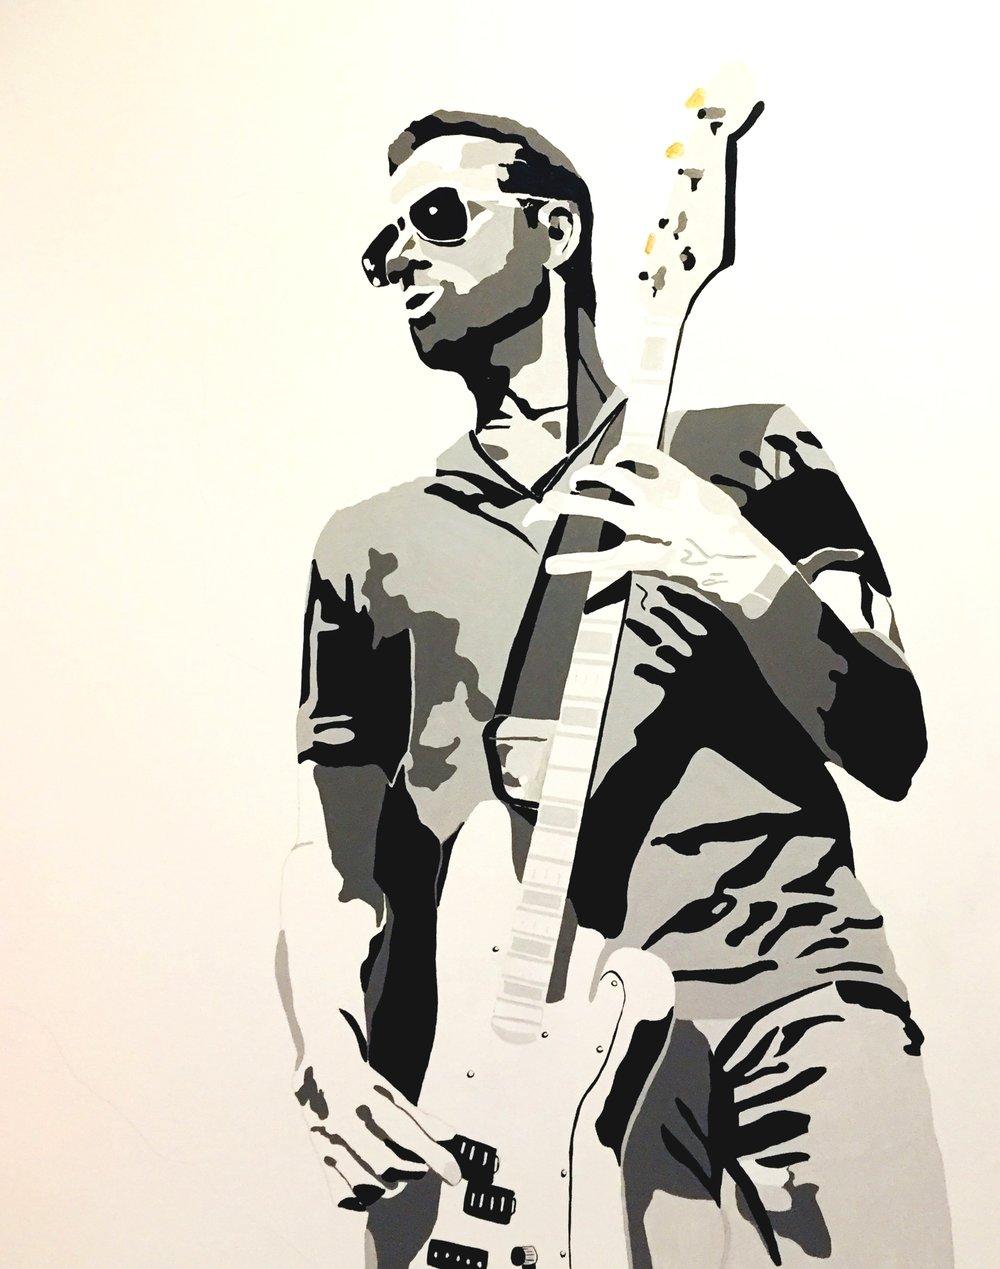 Robert Deleo - 30 x 40 Acrylic on Canvas 2018